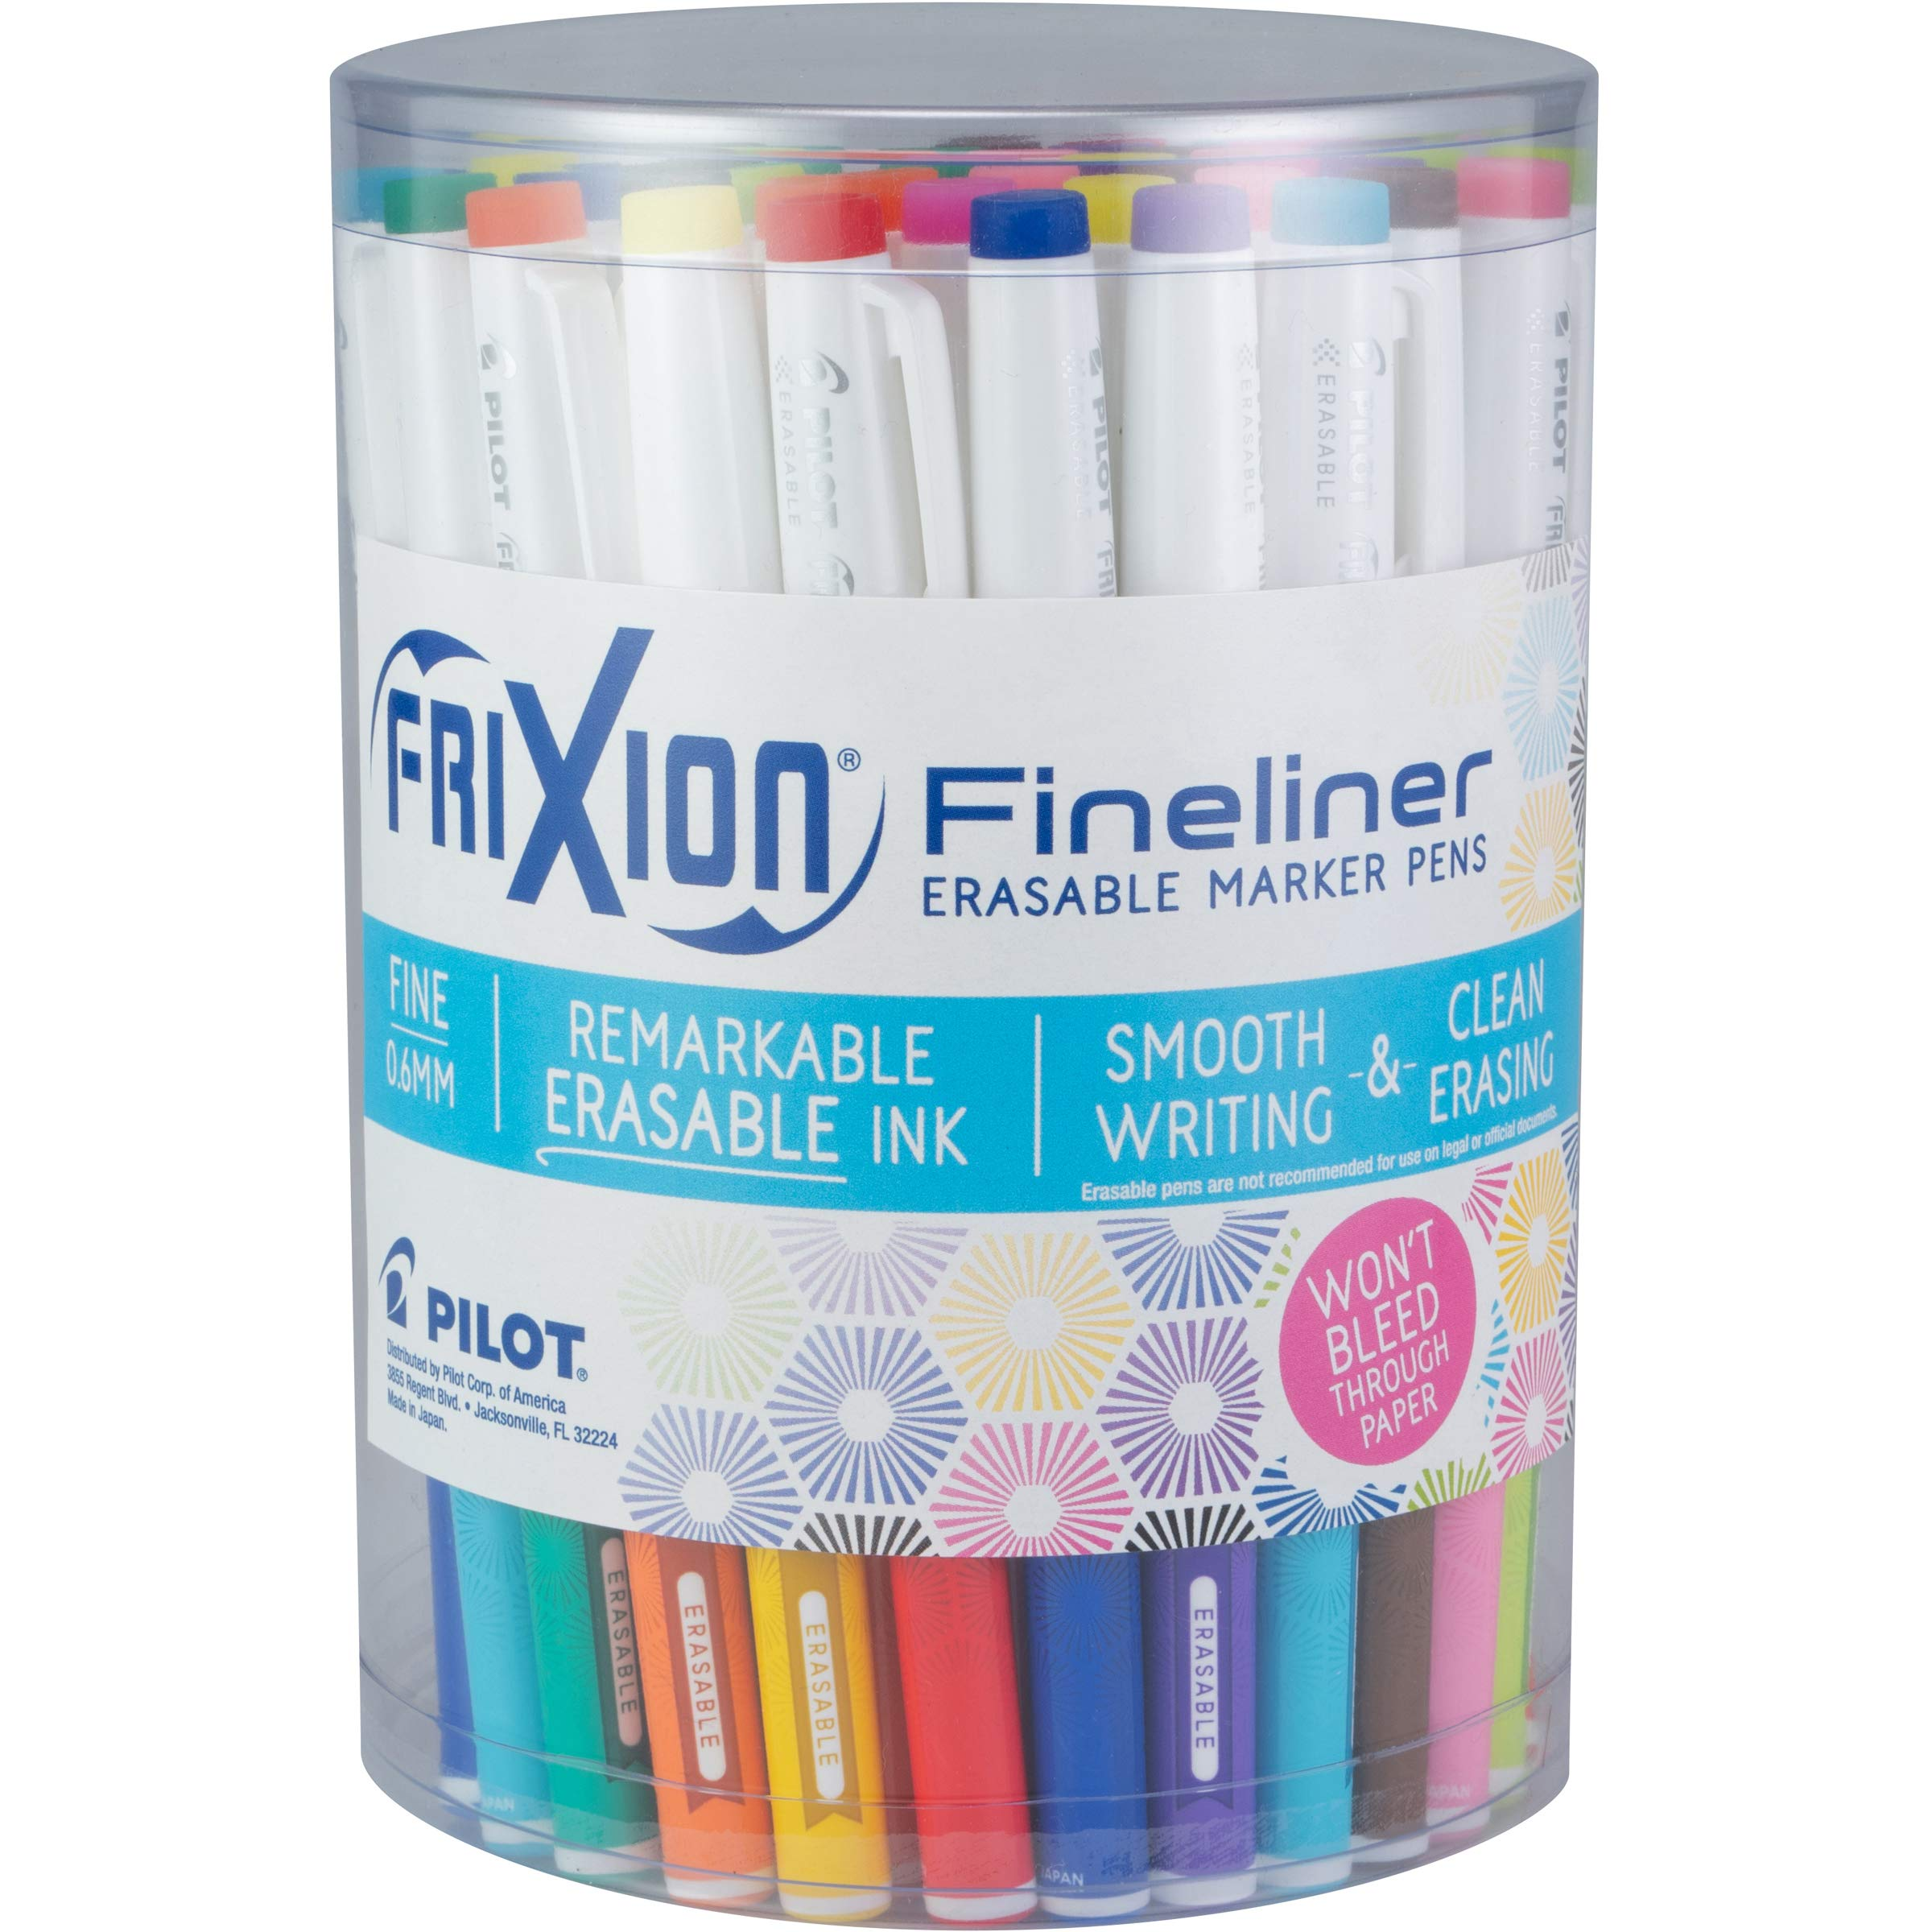 Pilot FriXion Fineliner Erasable Marker Pens, Fine Point, Assorted Colors, 36 Count